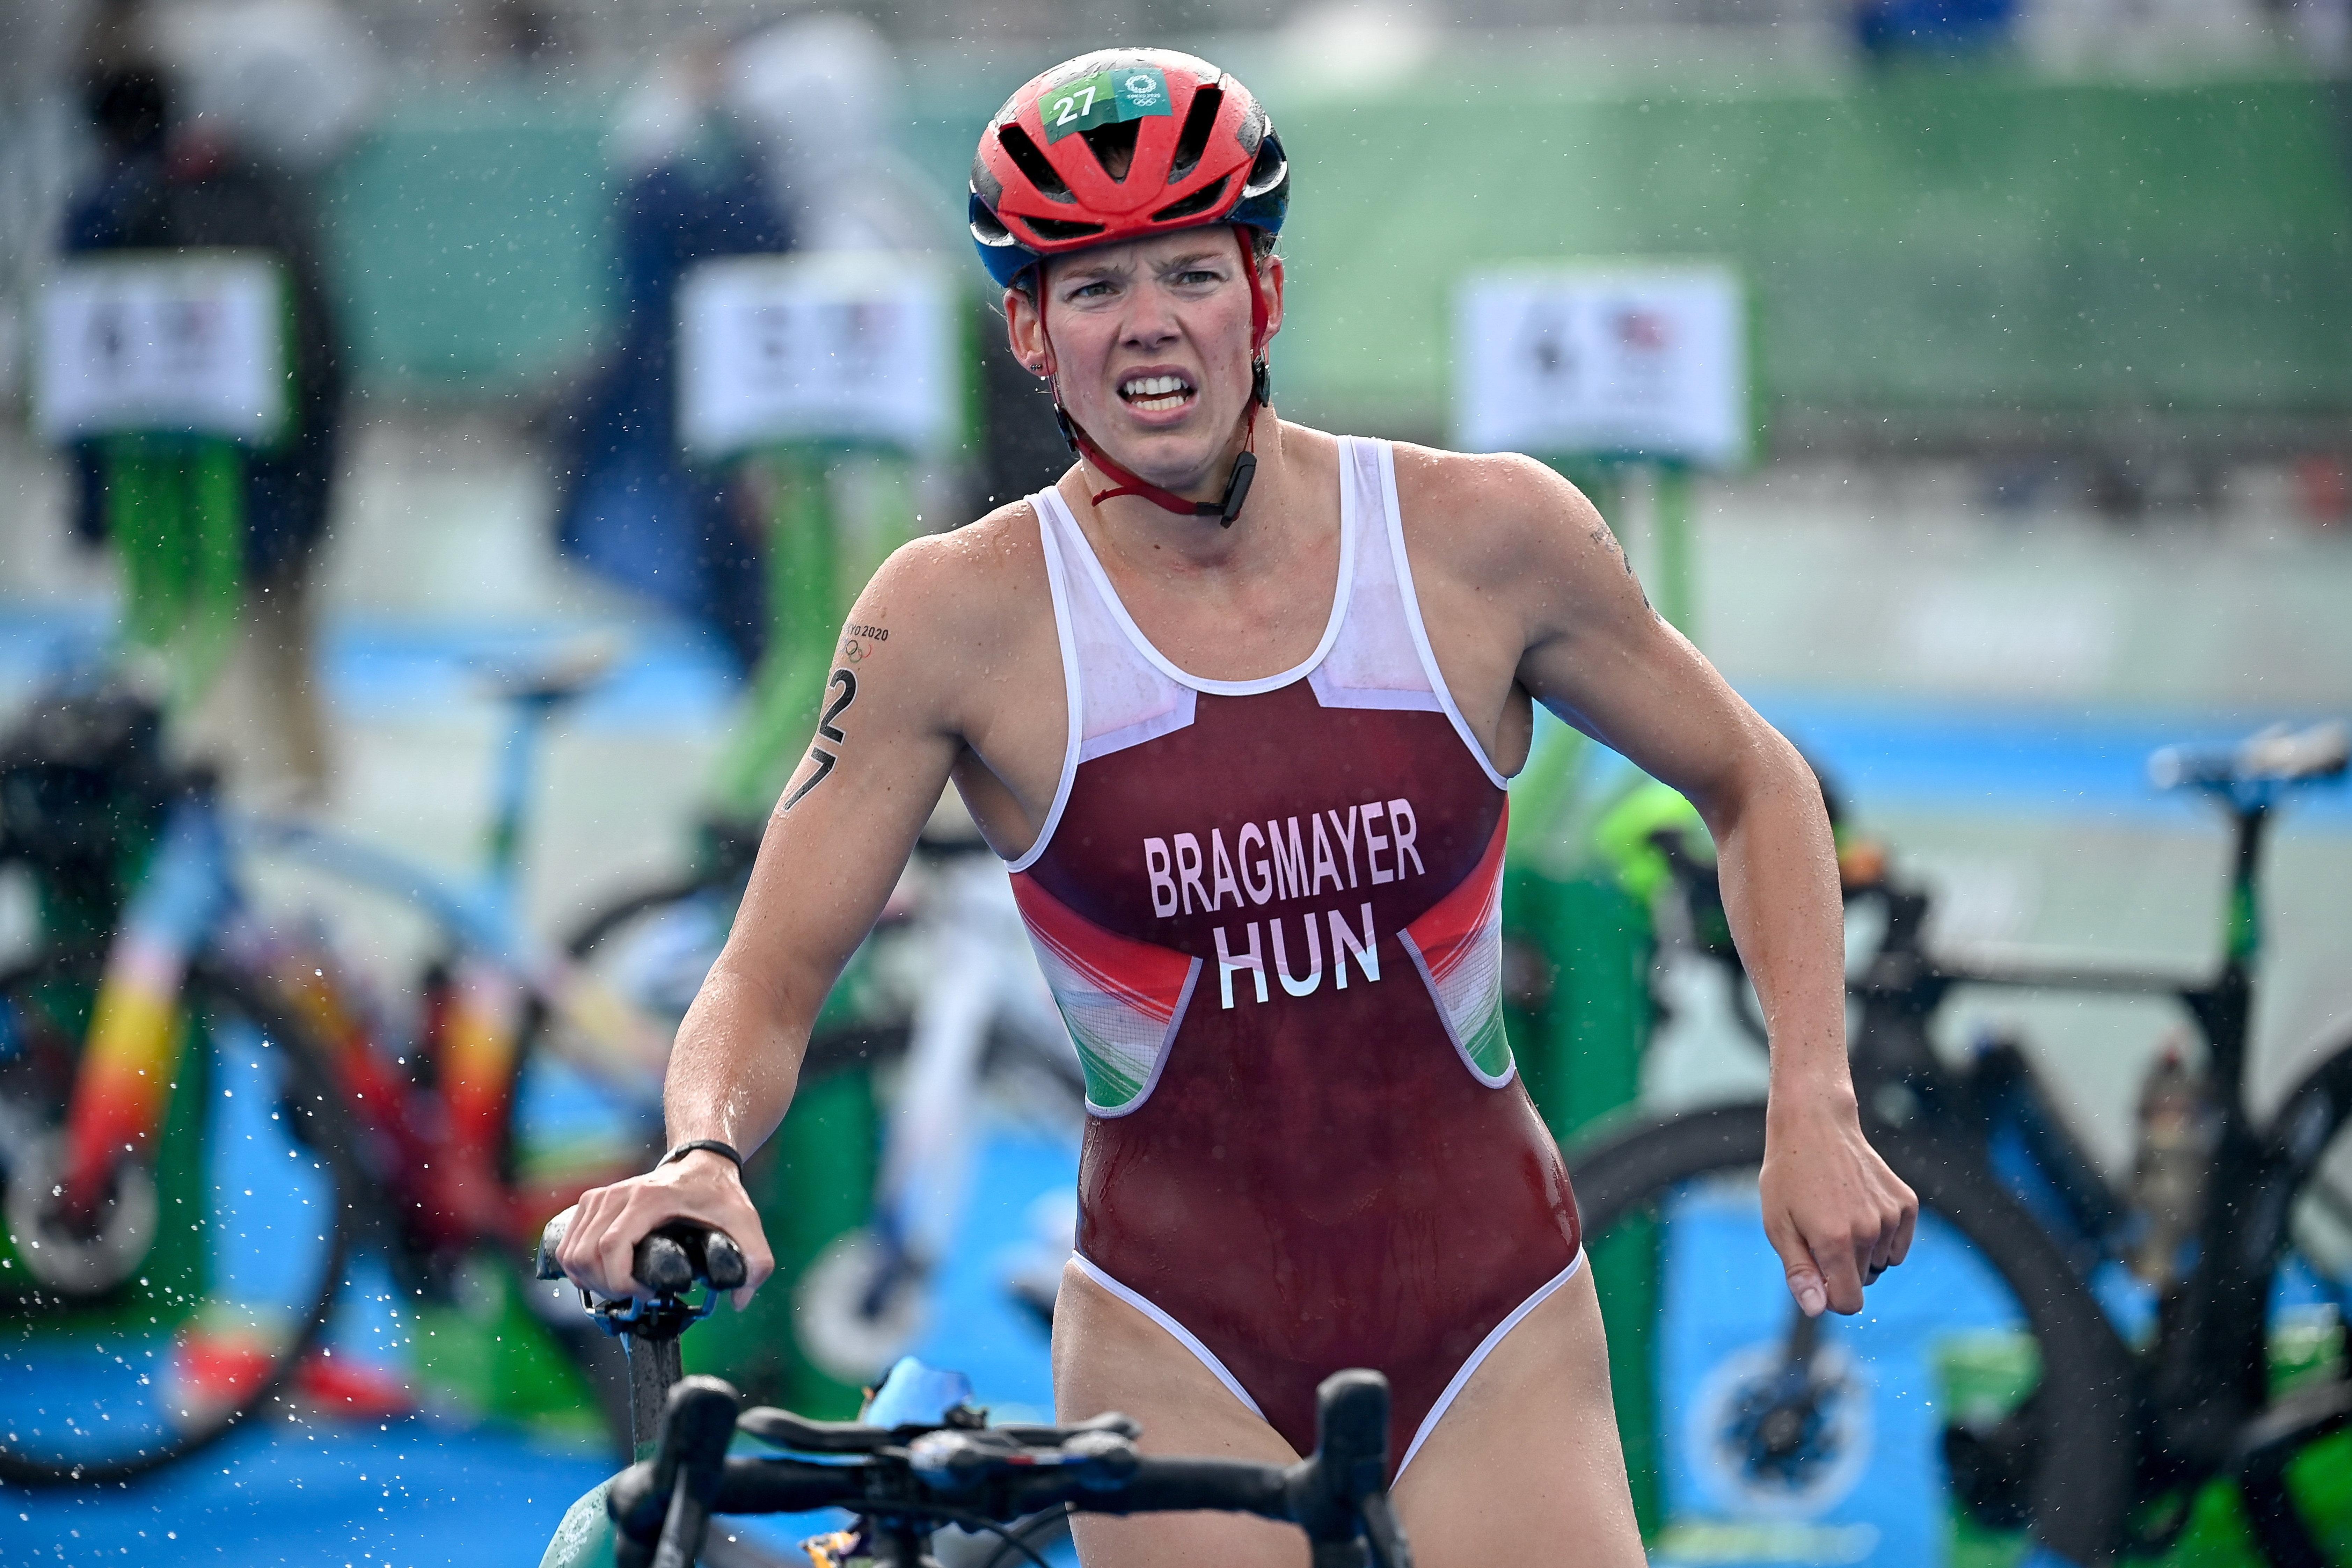 Tokiói olimpia: 12. lett Bragmayer Zsanett triatlonban